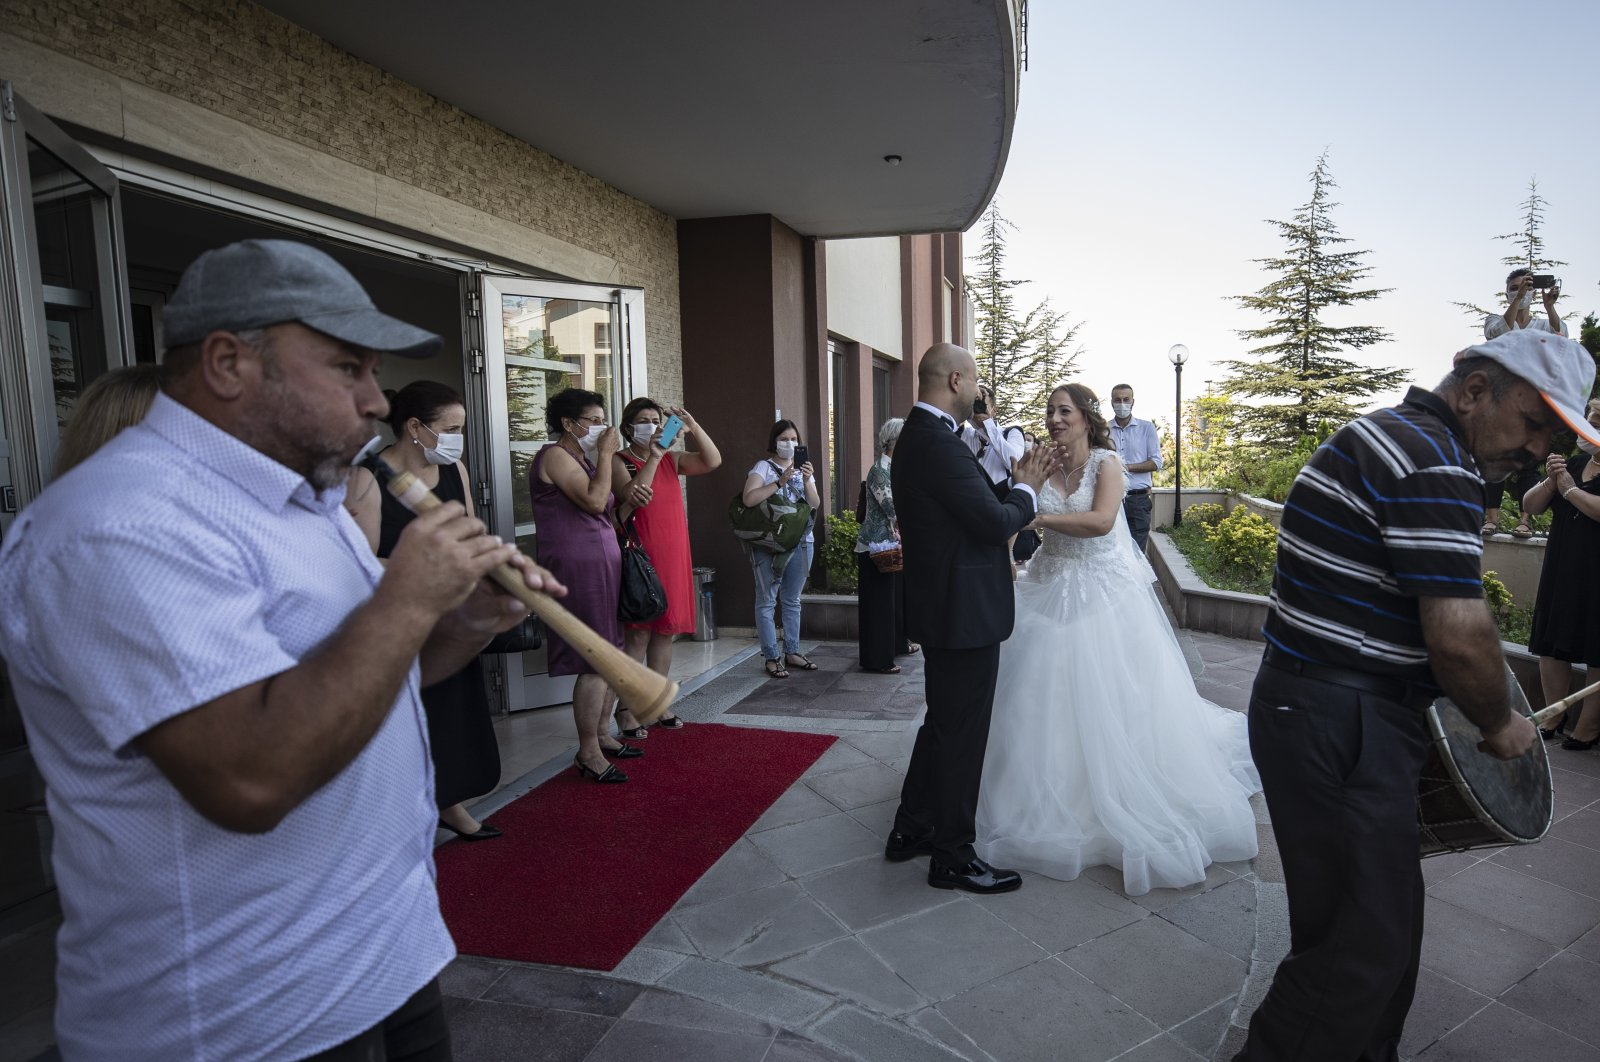 Two musicians play at a street wedding in the capital Ankara, Turkey, Aug. 11, 2020. (AA Photo)